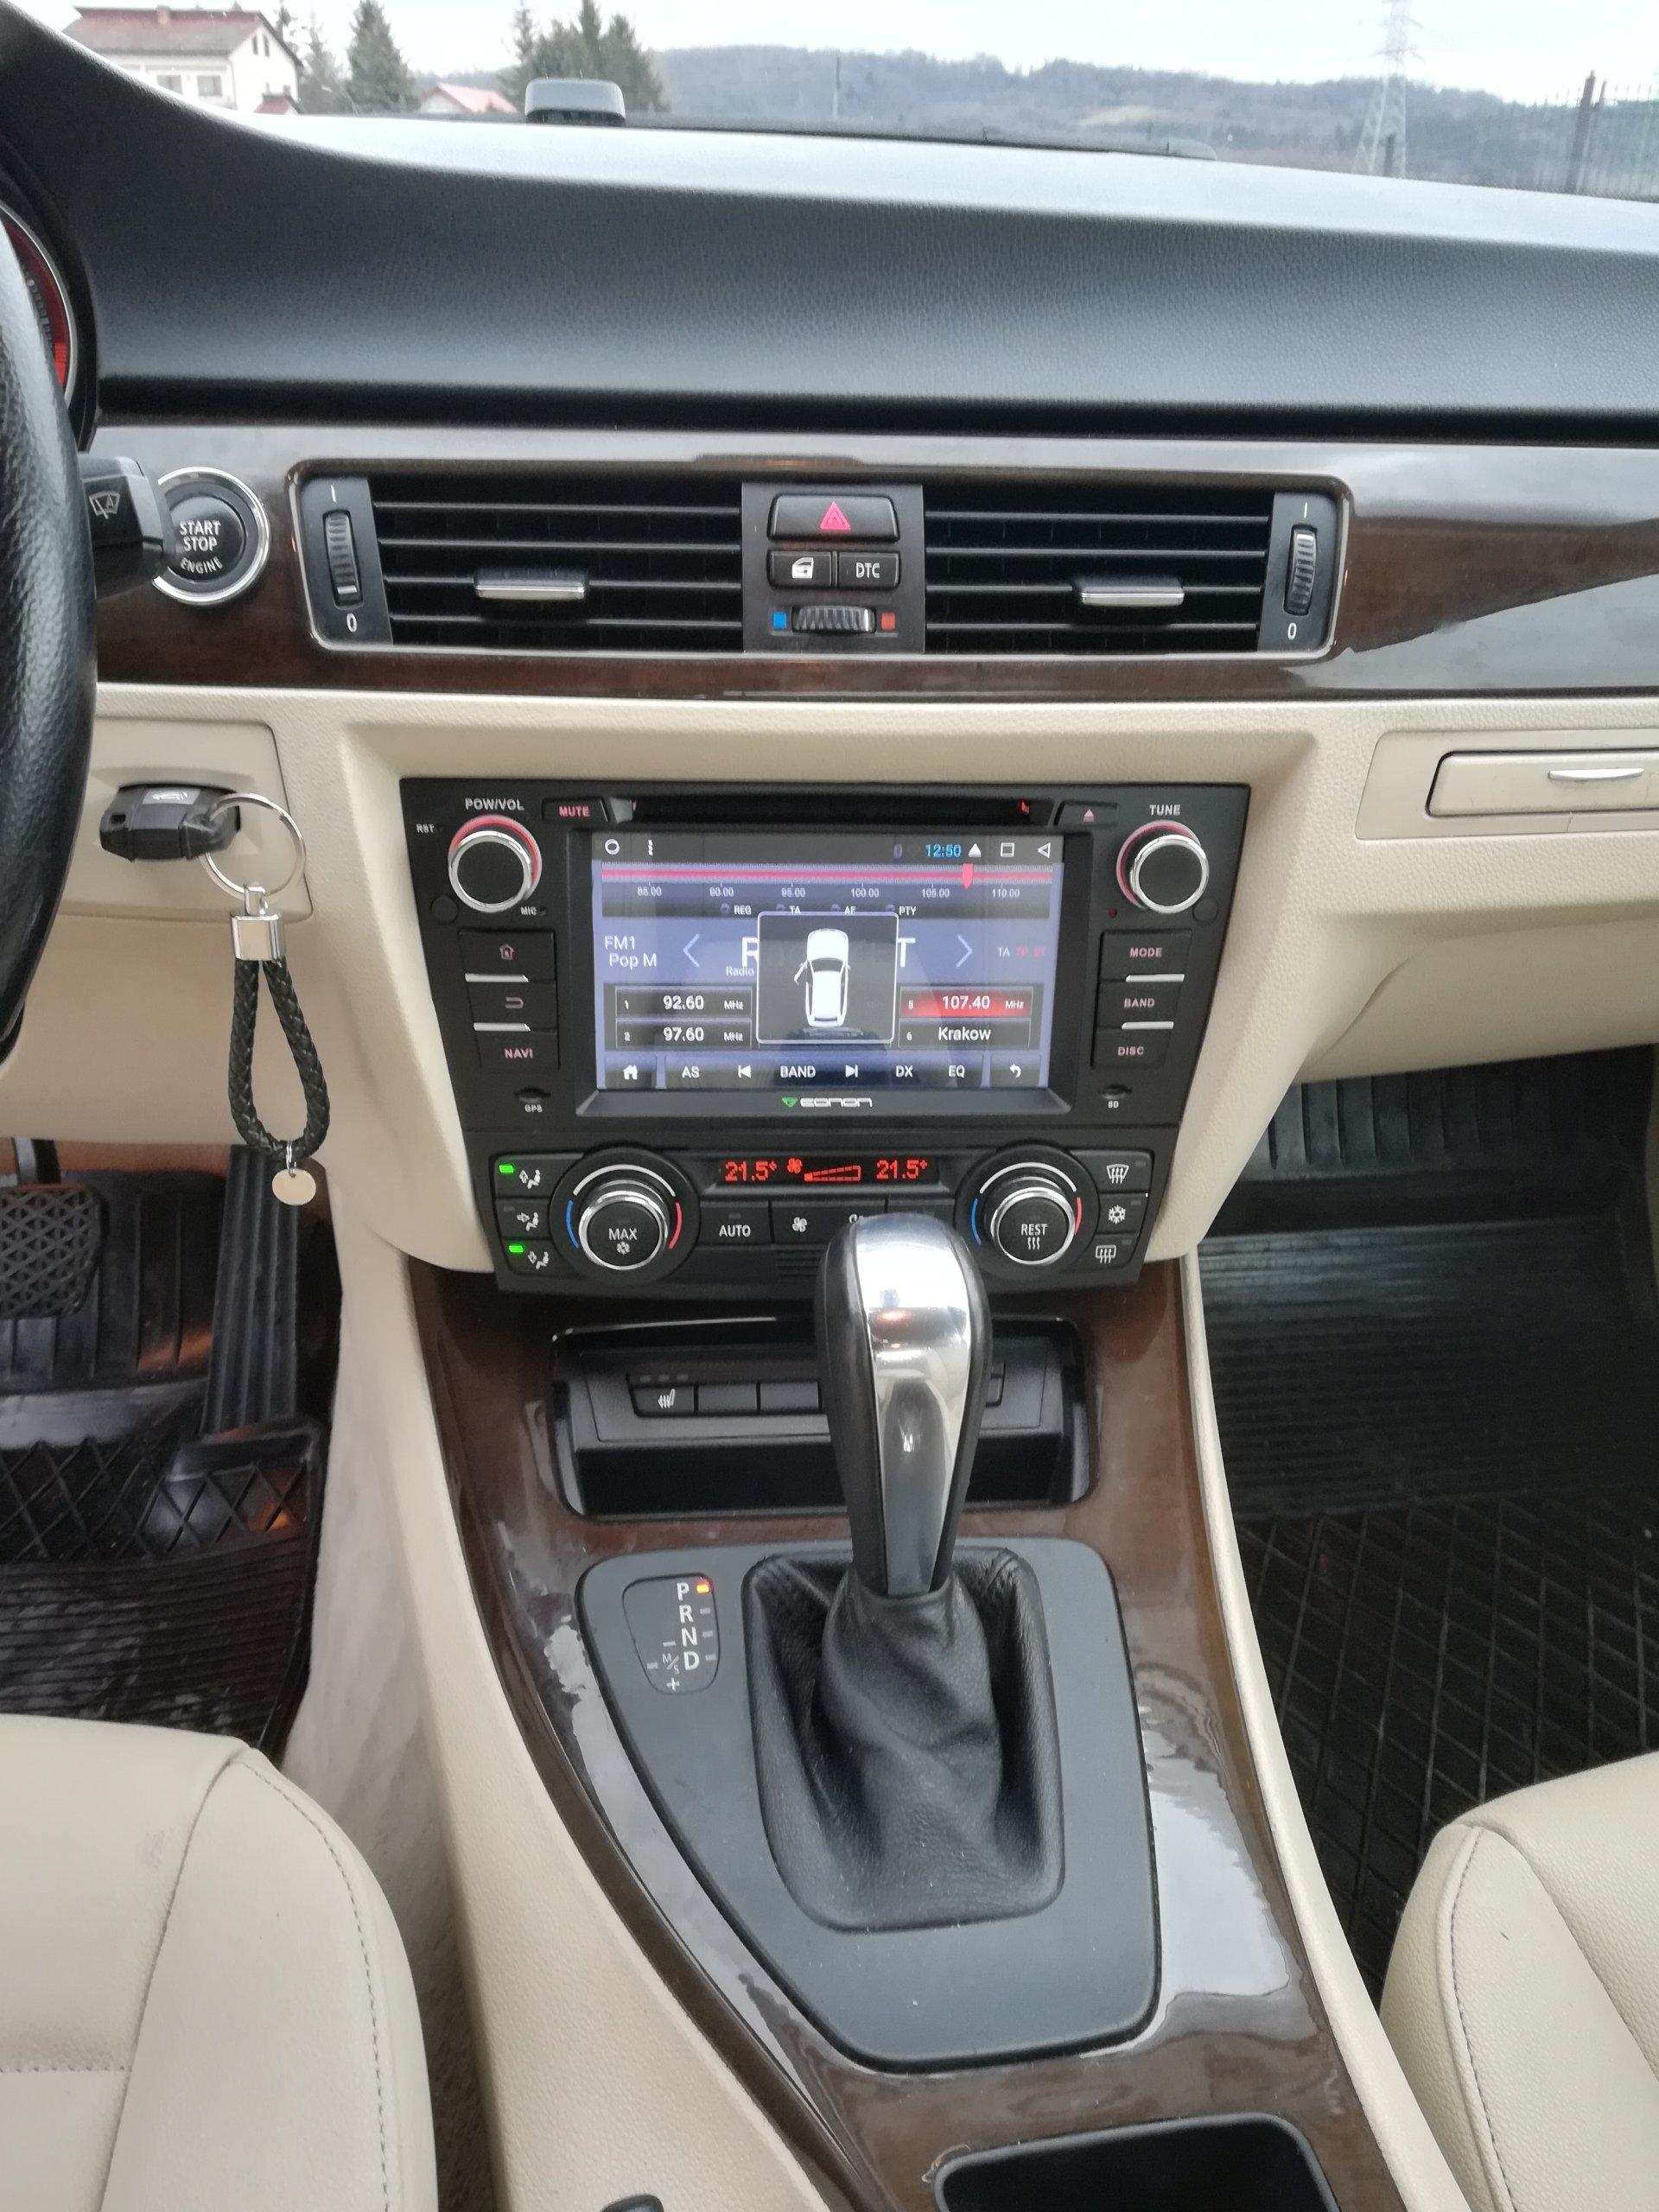 Radio nawigacja bmw e90 e91 e92 EONON android 6 0